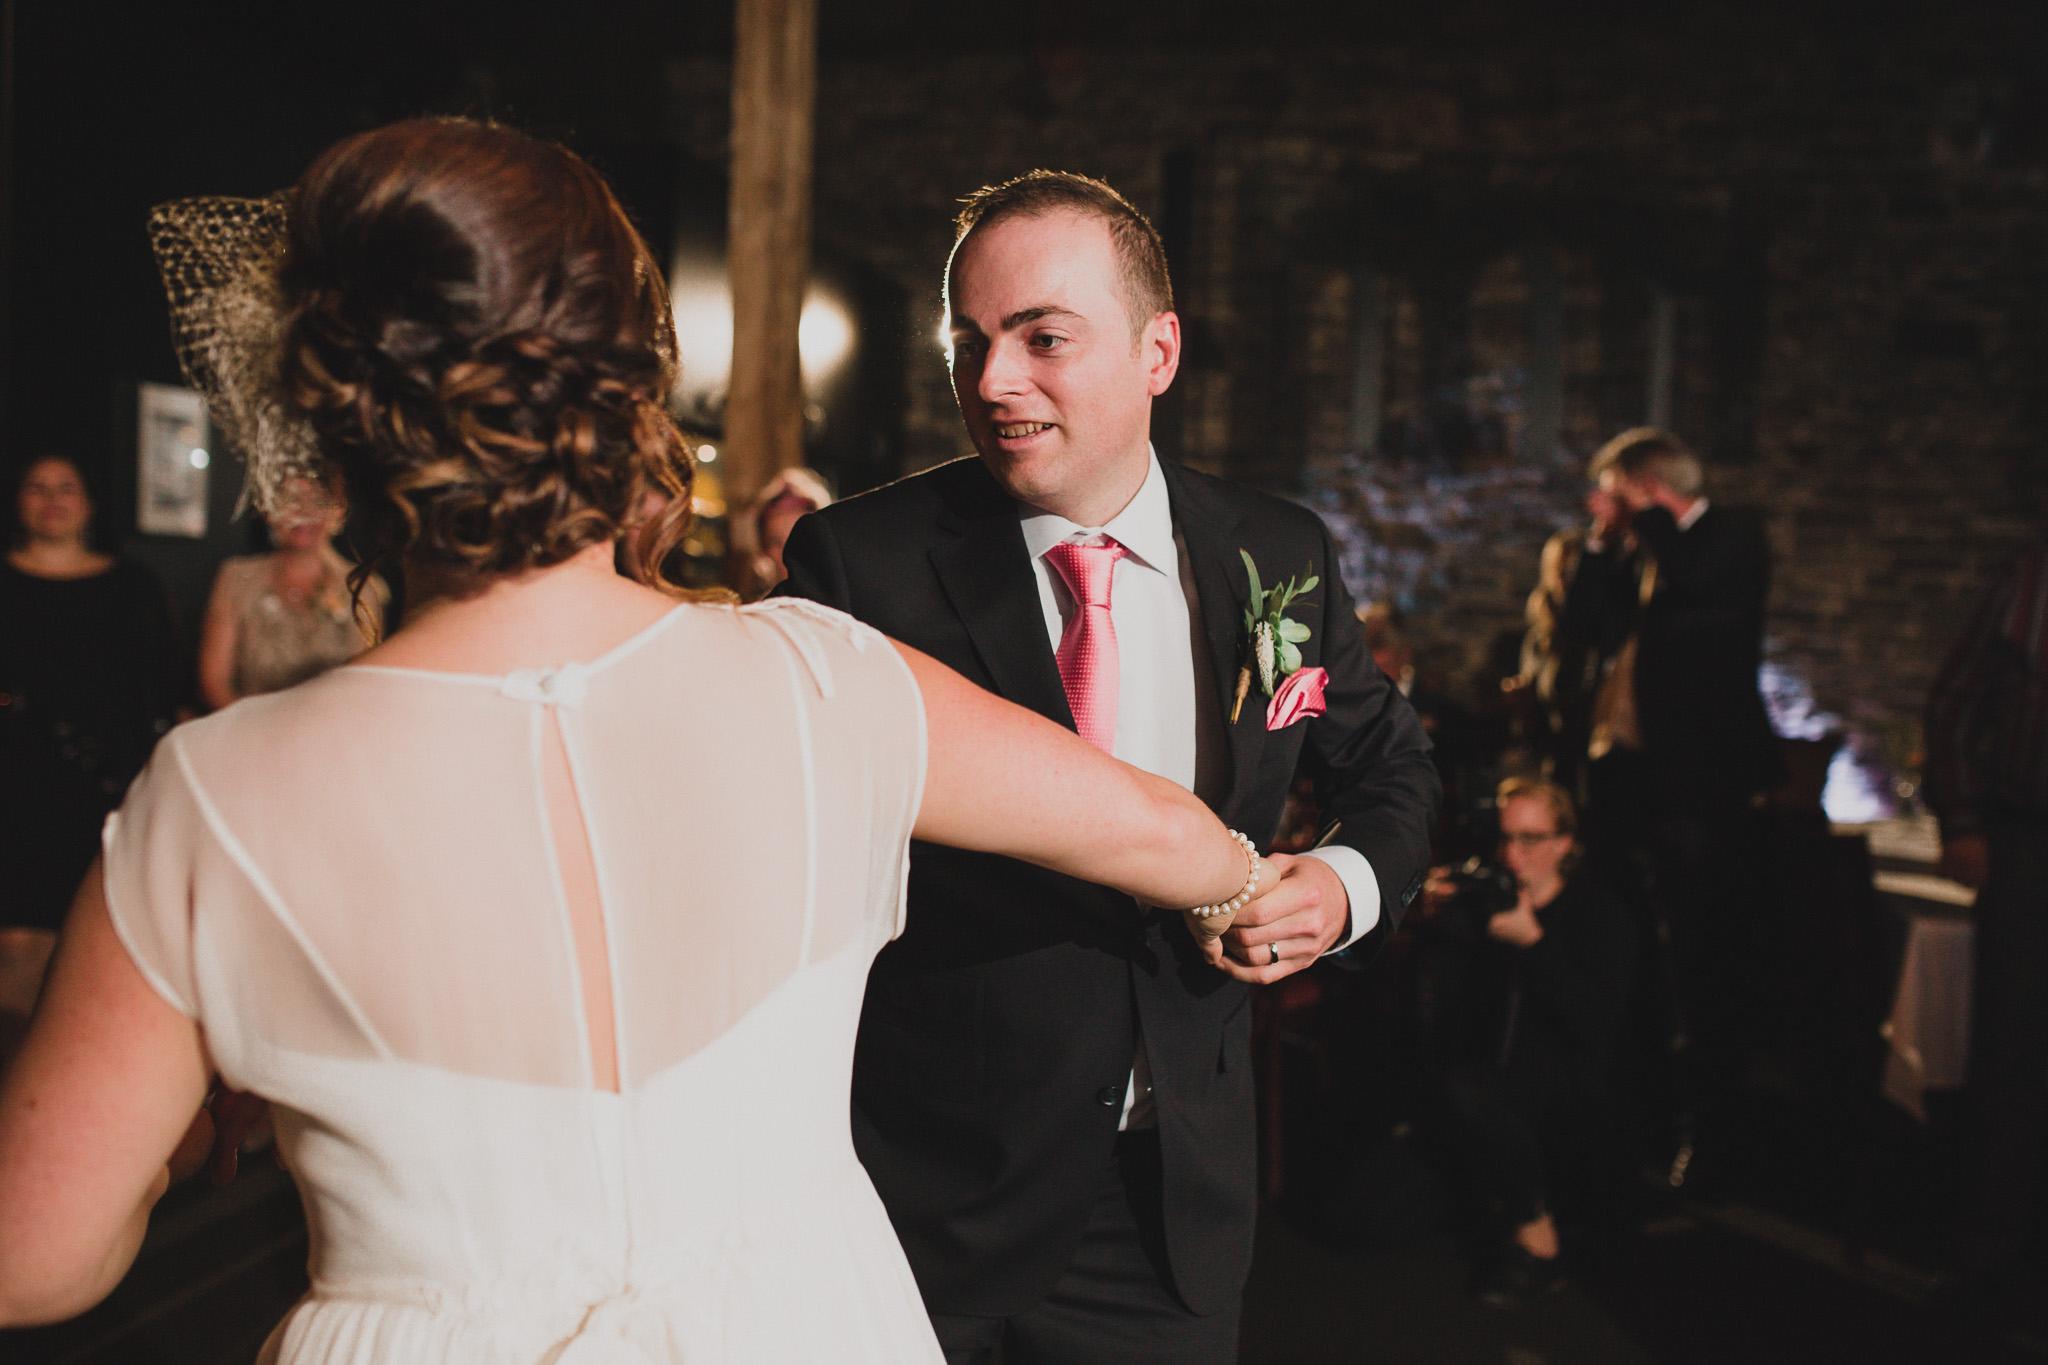 Professional Wedding Photos Ottawa Perth